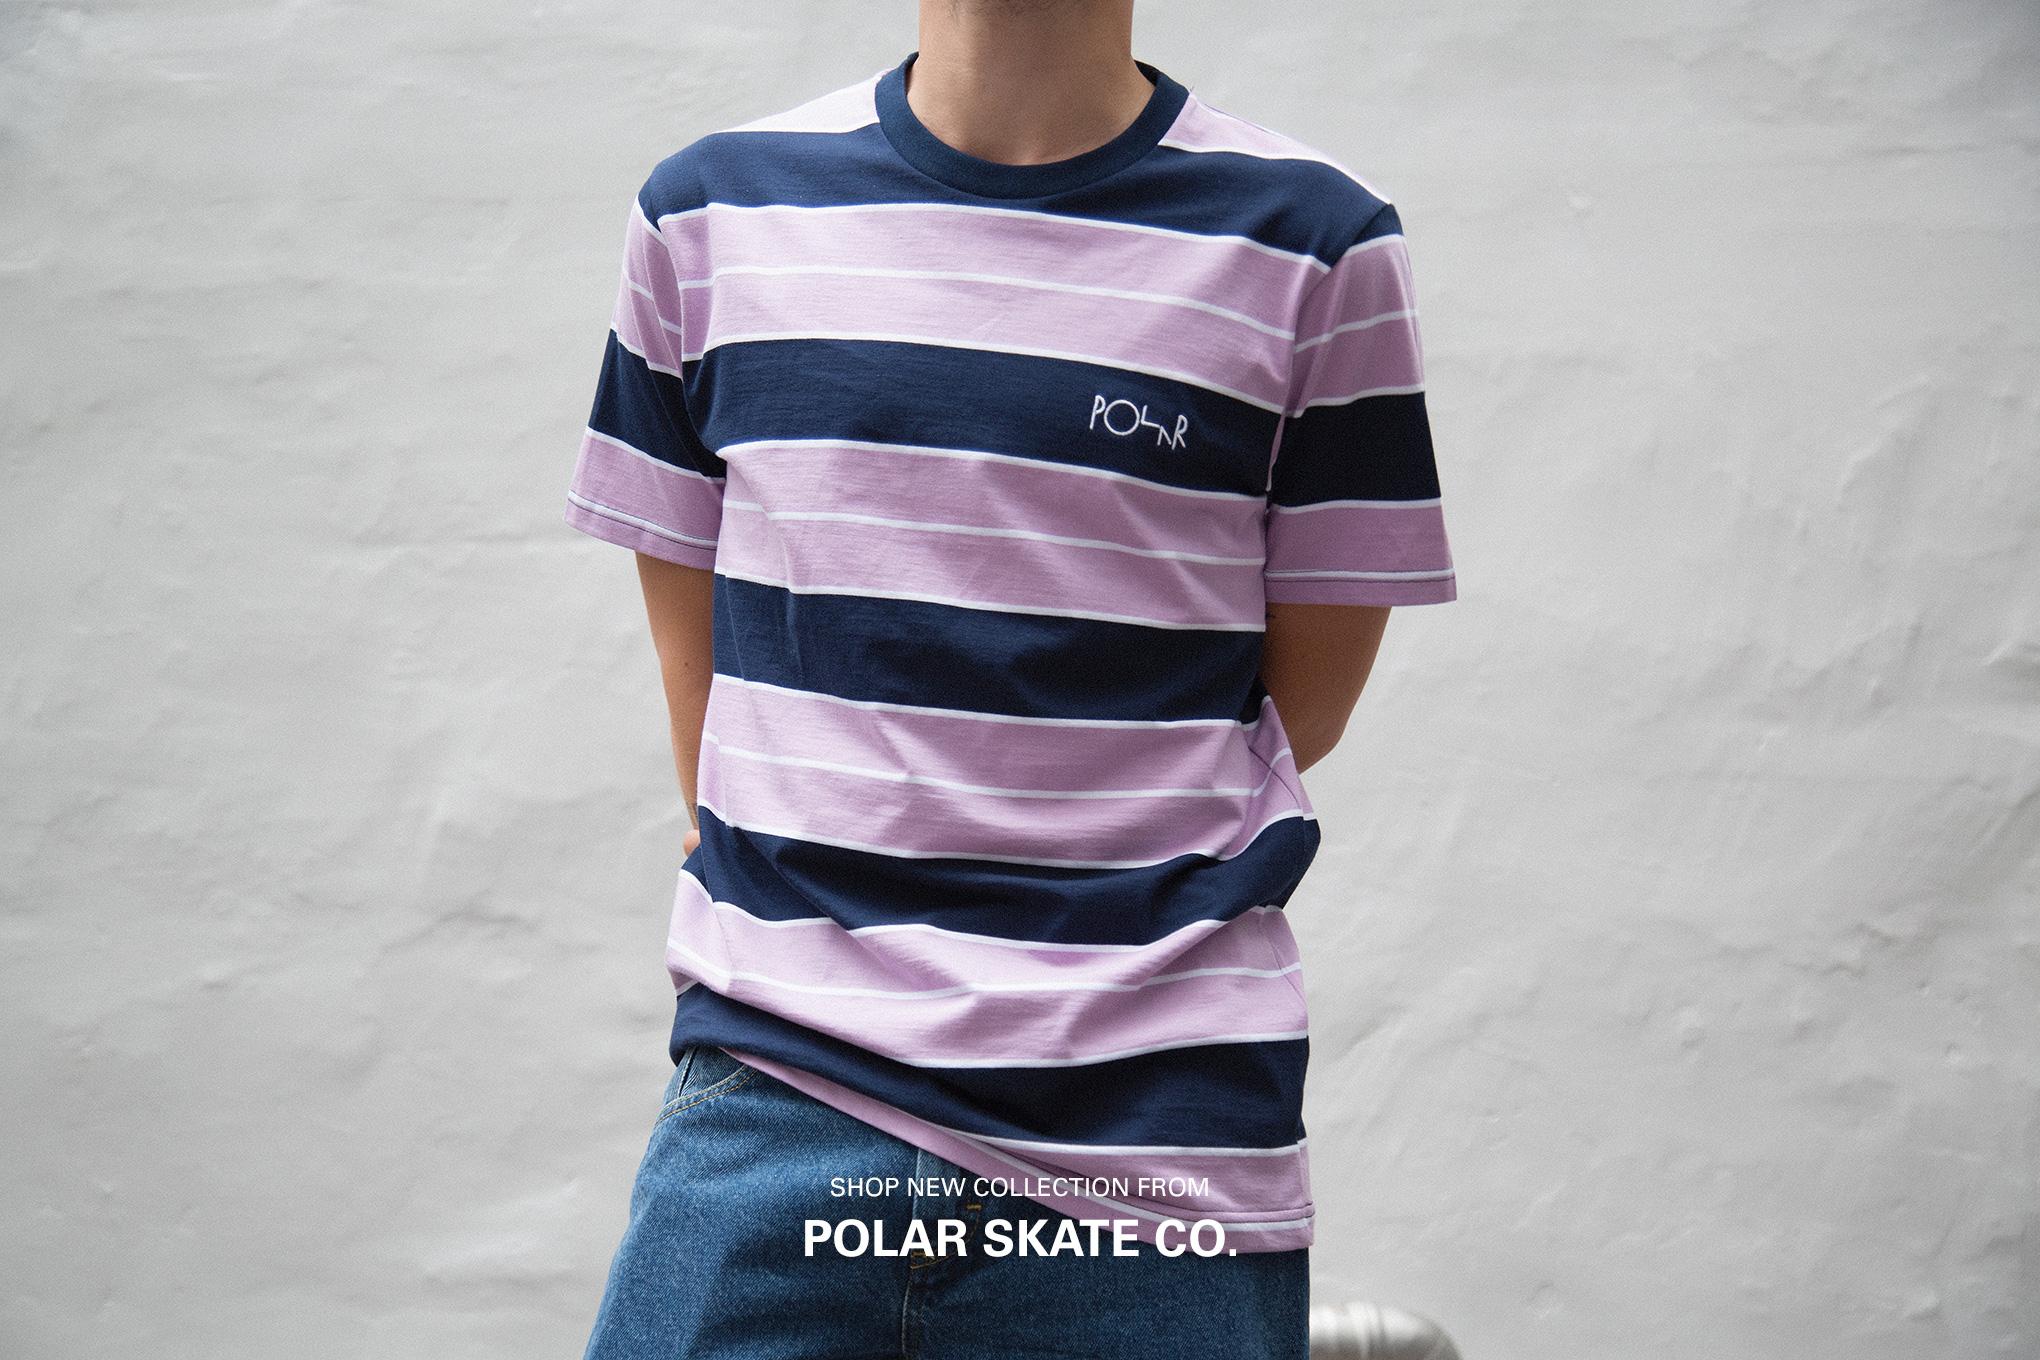 Polar Skate Co. Summer 2016 Collection - Shop now at Streetmachine Copenhagen.